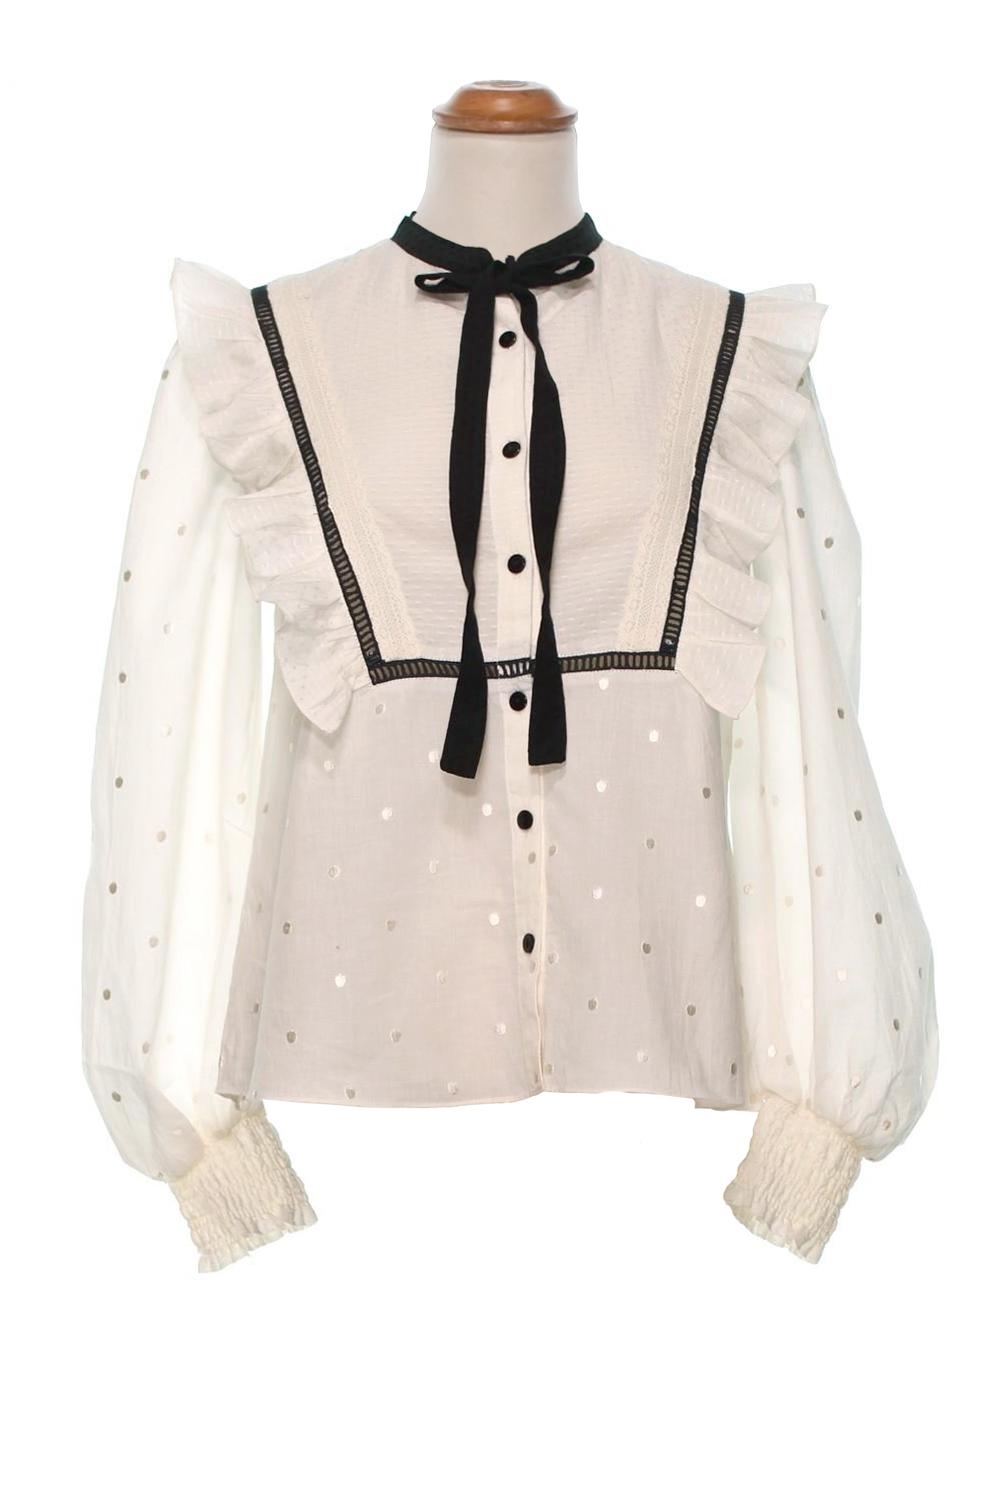 Millie Mackintosh x CoppaFeel! blouse.jpg